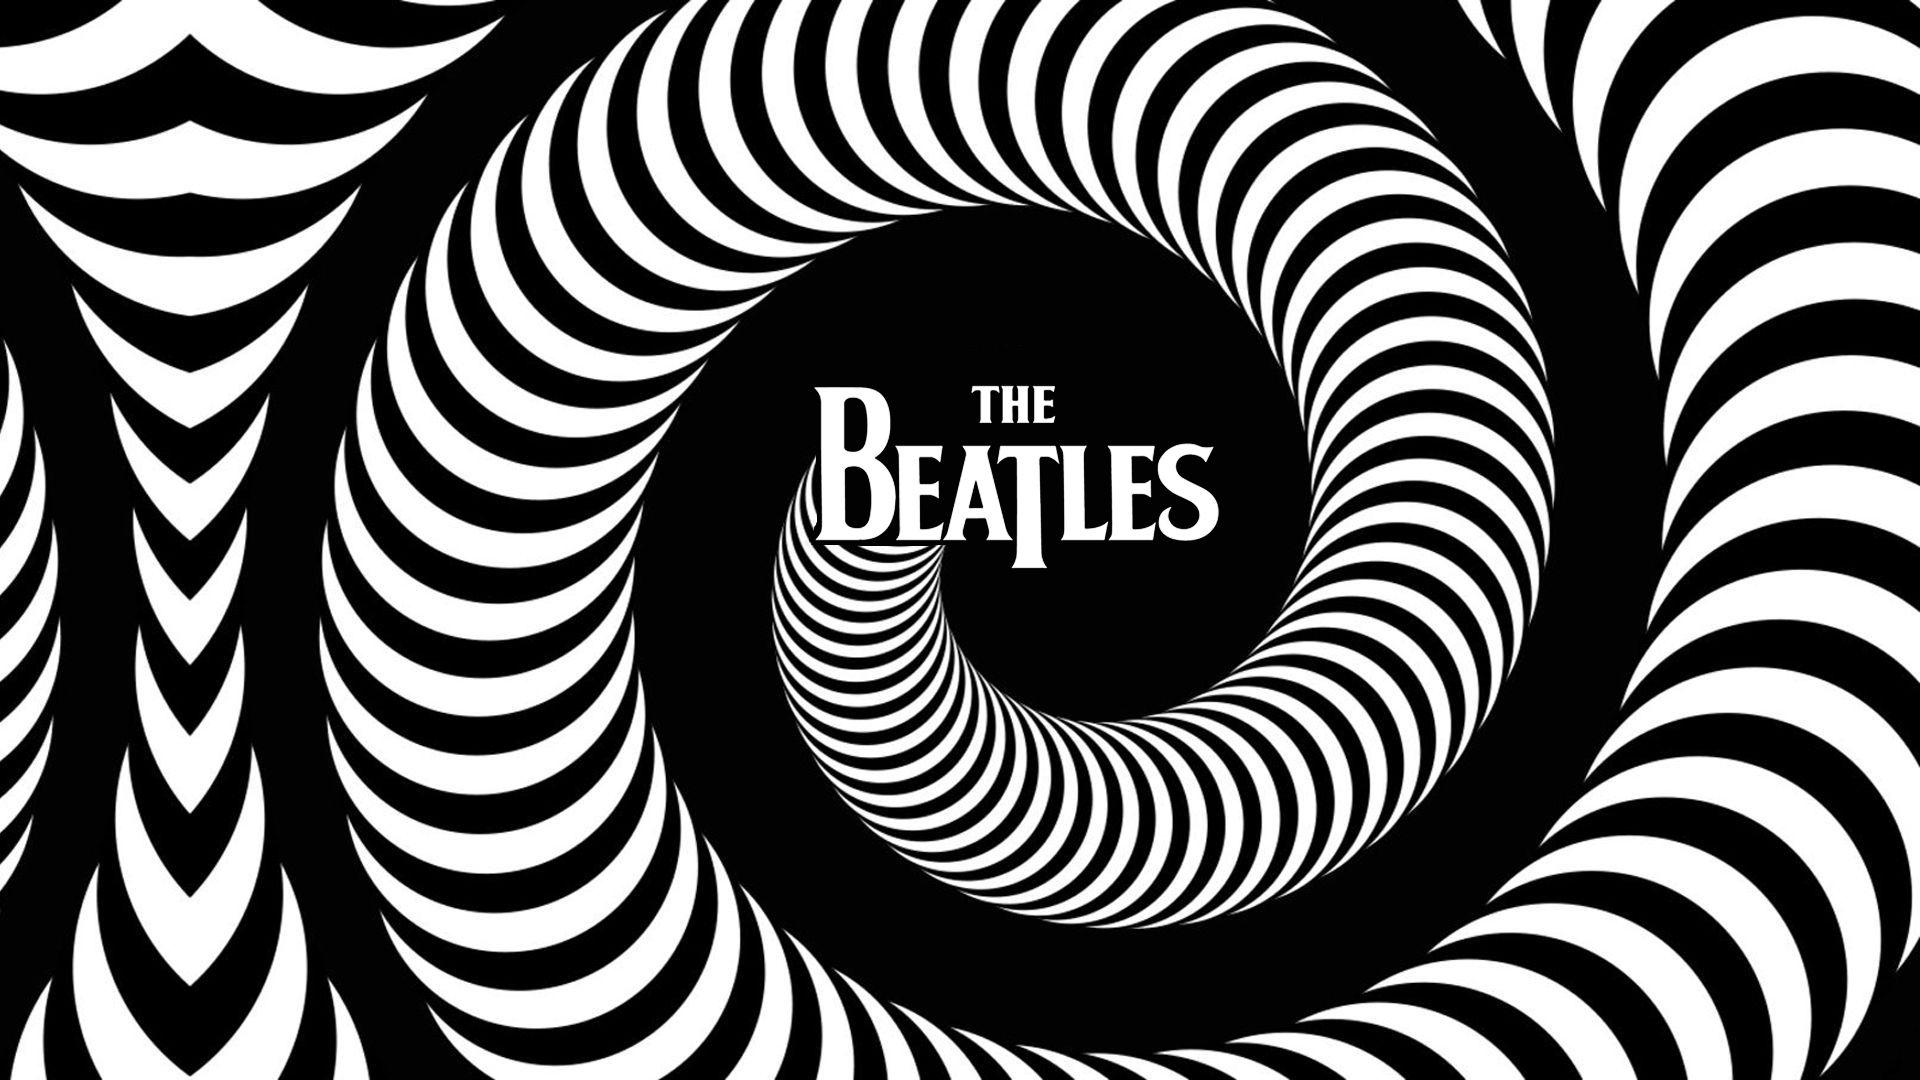 The Beatles Iphone 5 Wallpaper The Beatles Full Hd Fondo De Pantalla And Fondo De